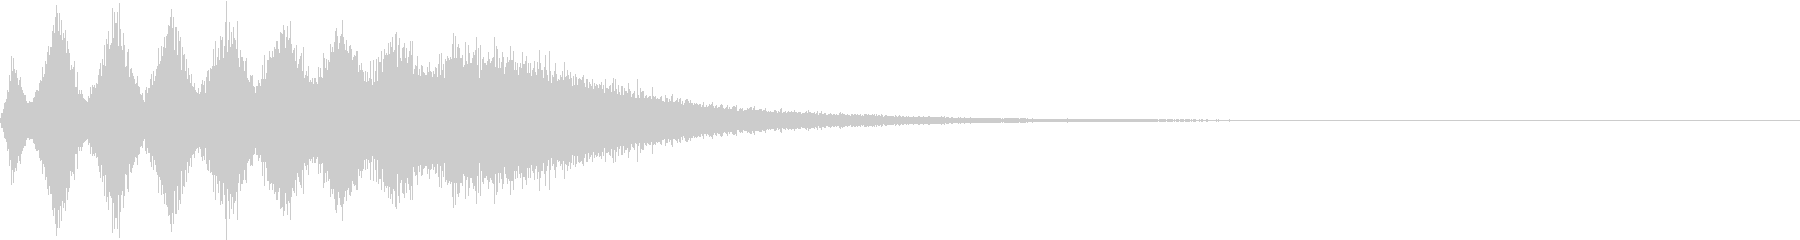 TVFX 目立たせ・アイキャッチ 6の未再生の波形